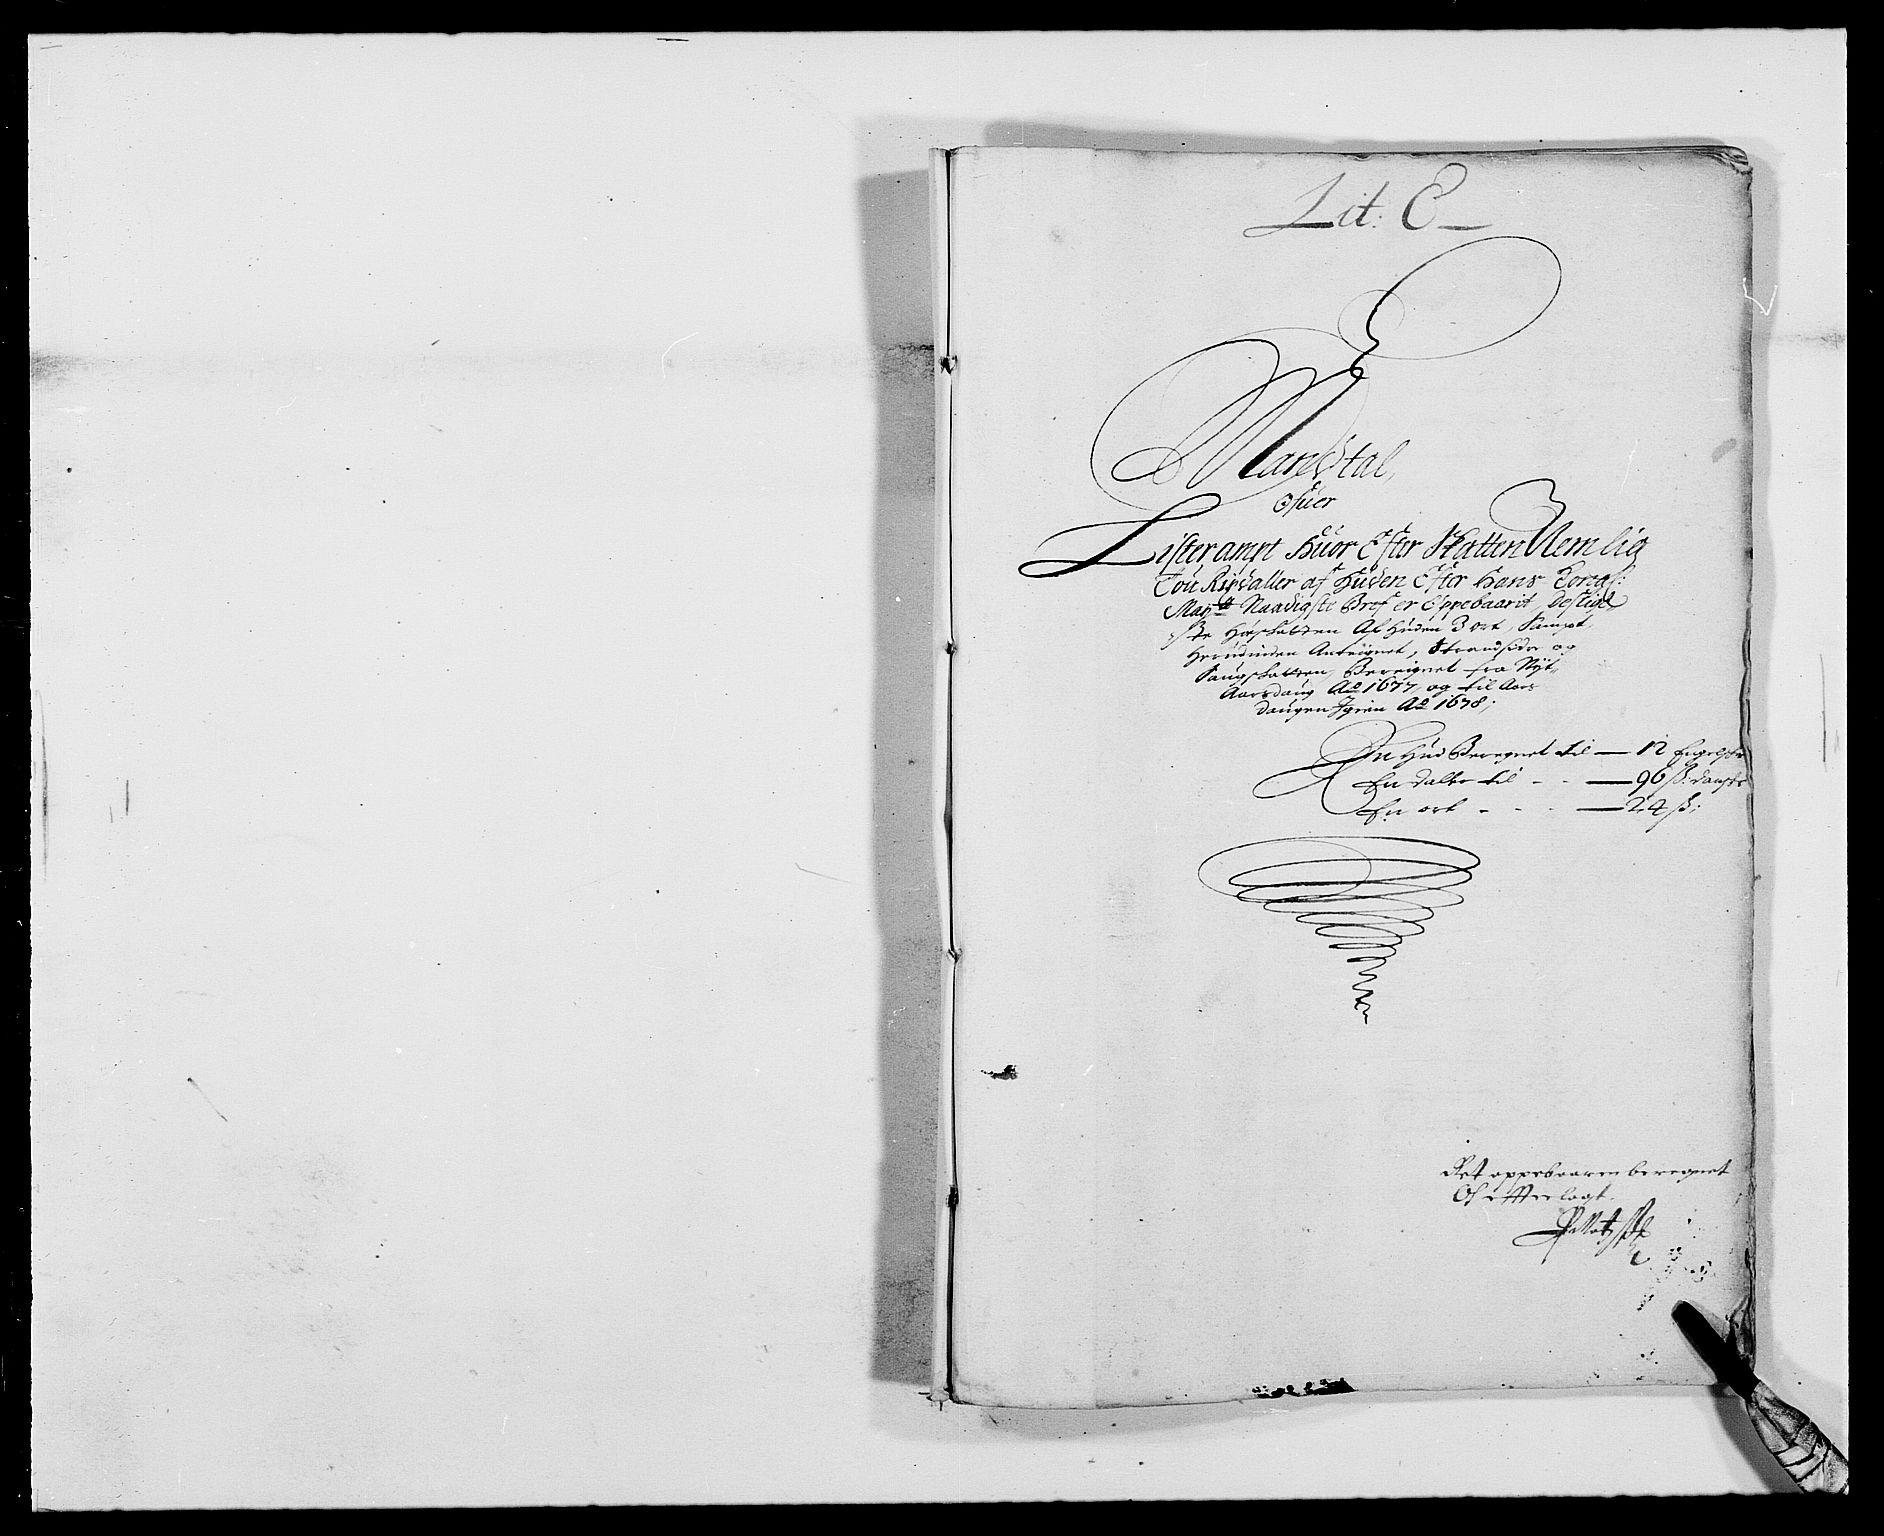 RA, Rentekammeret inntil 1814, Reviderte regnskaper, Fogderegnskap, R41/L2530: Fogderegnskap Lista, 1677-1679, s. 41